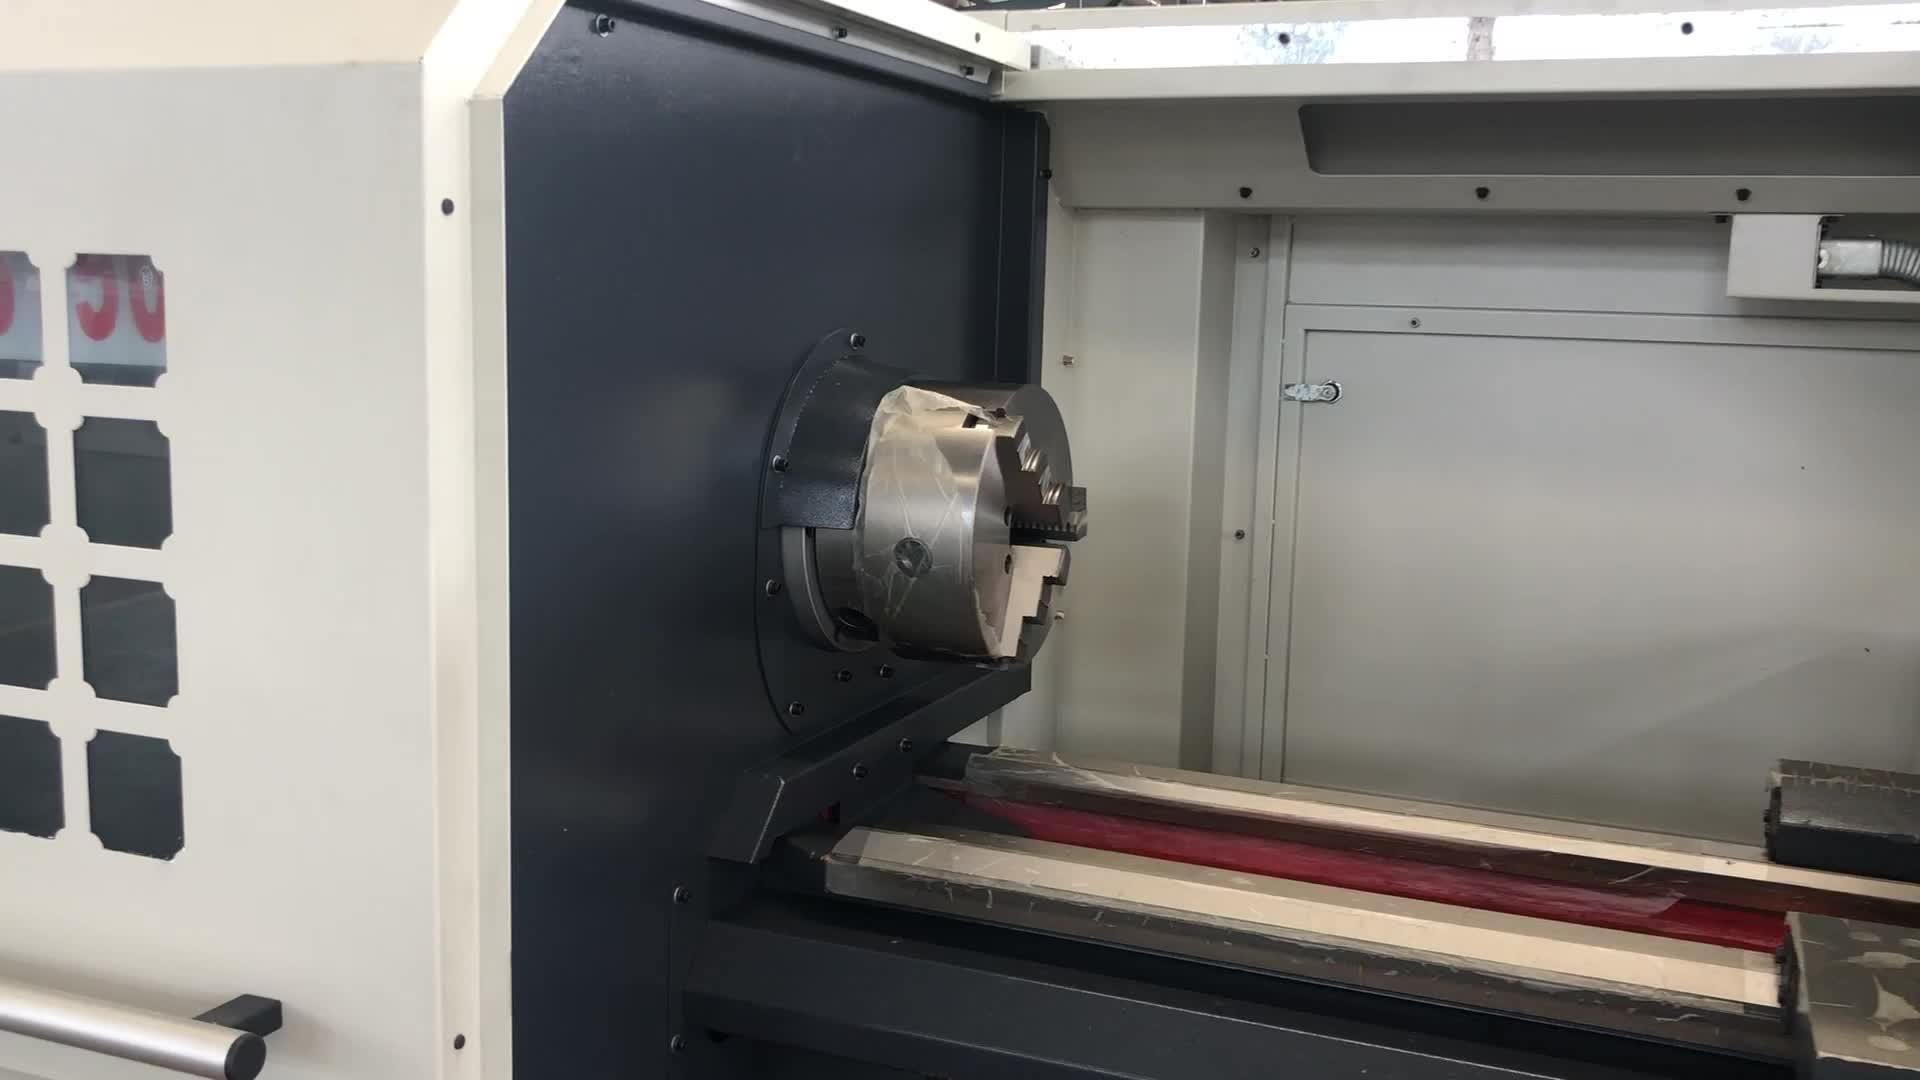 Horizontale taiwan CNC draaibank machine prijs CK6150 cnc draaibank fanuc systeem